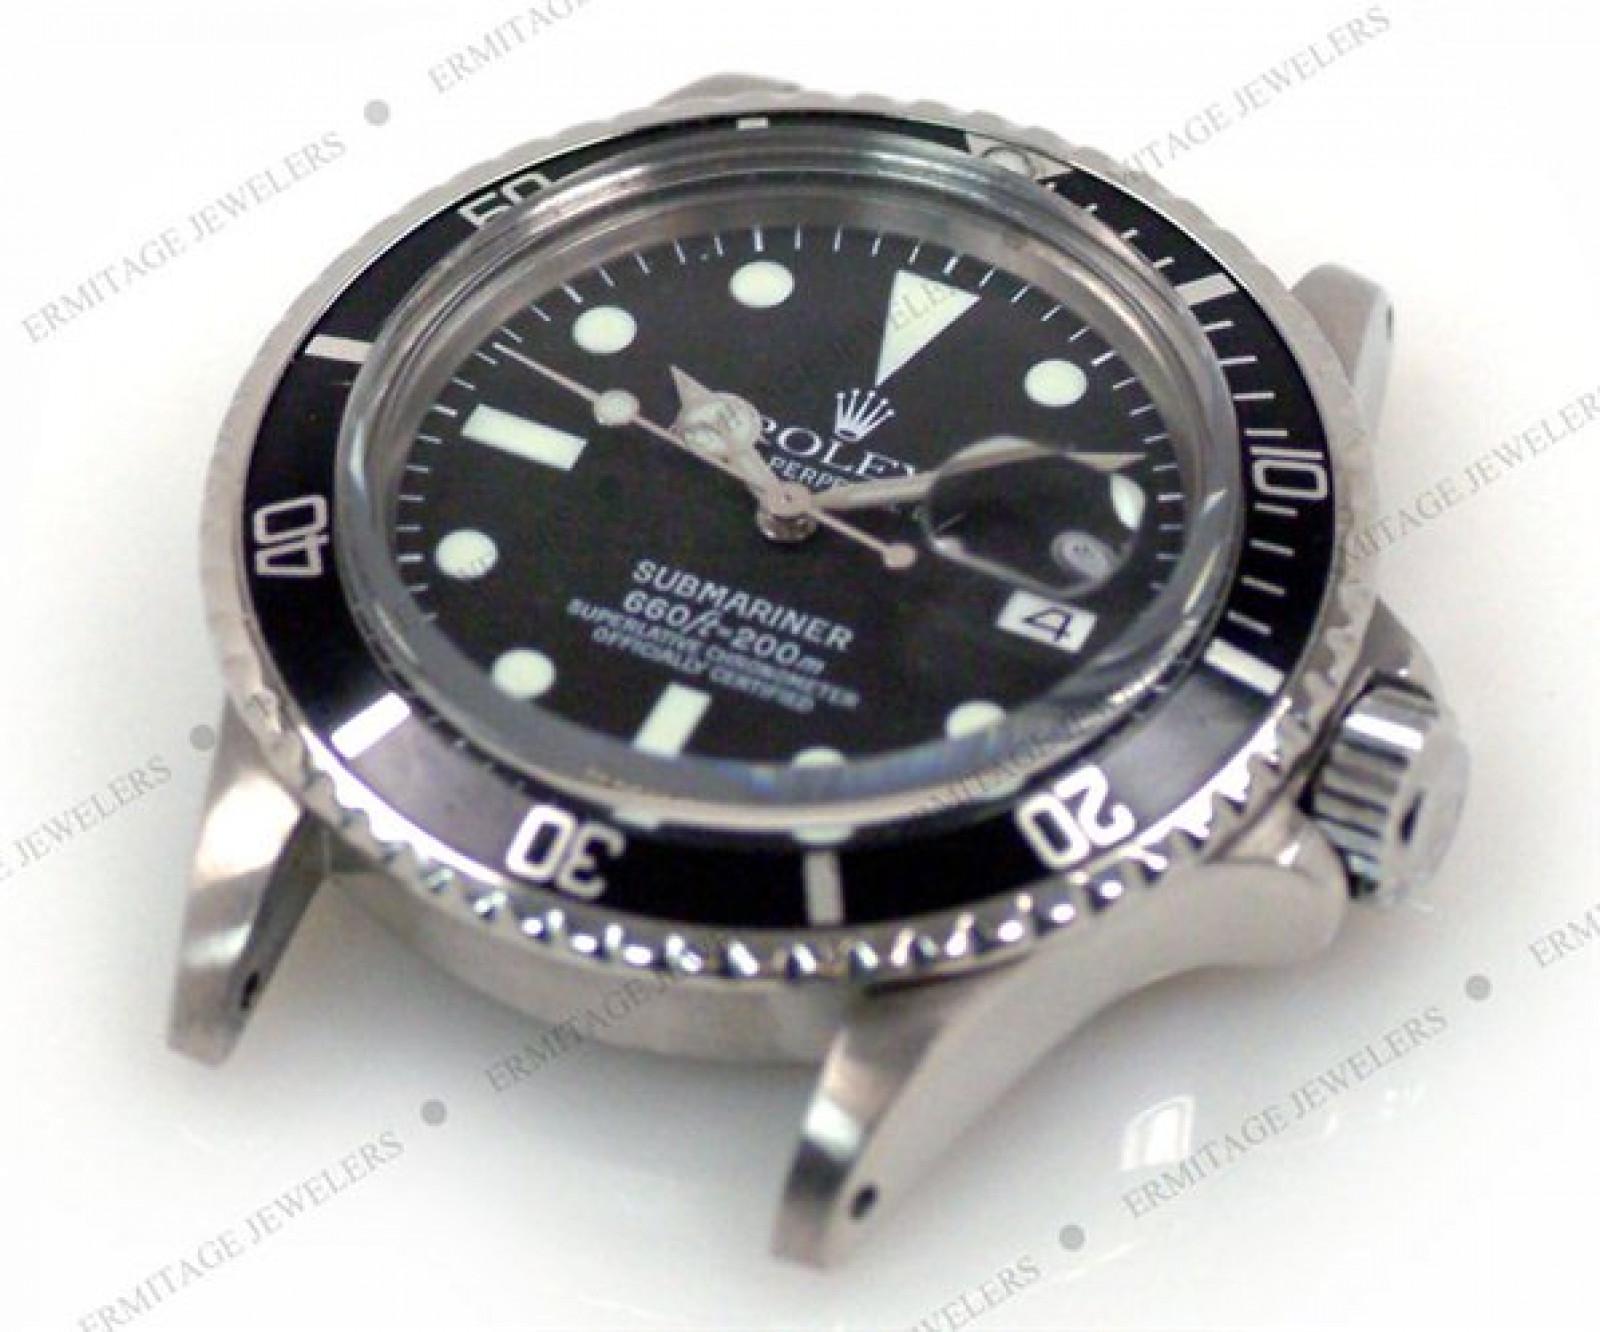 Vintage Rolex Submariner 1680 Steel with Black Dial 1970